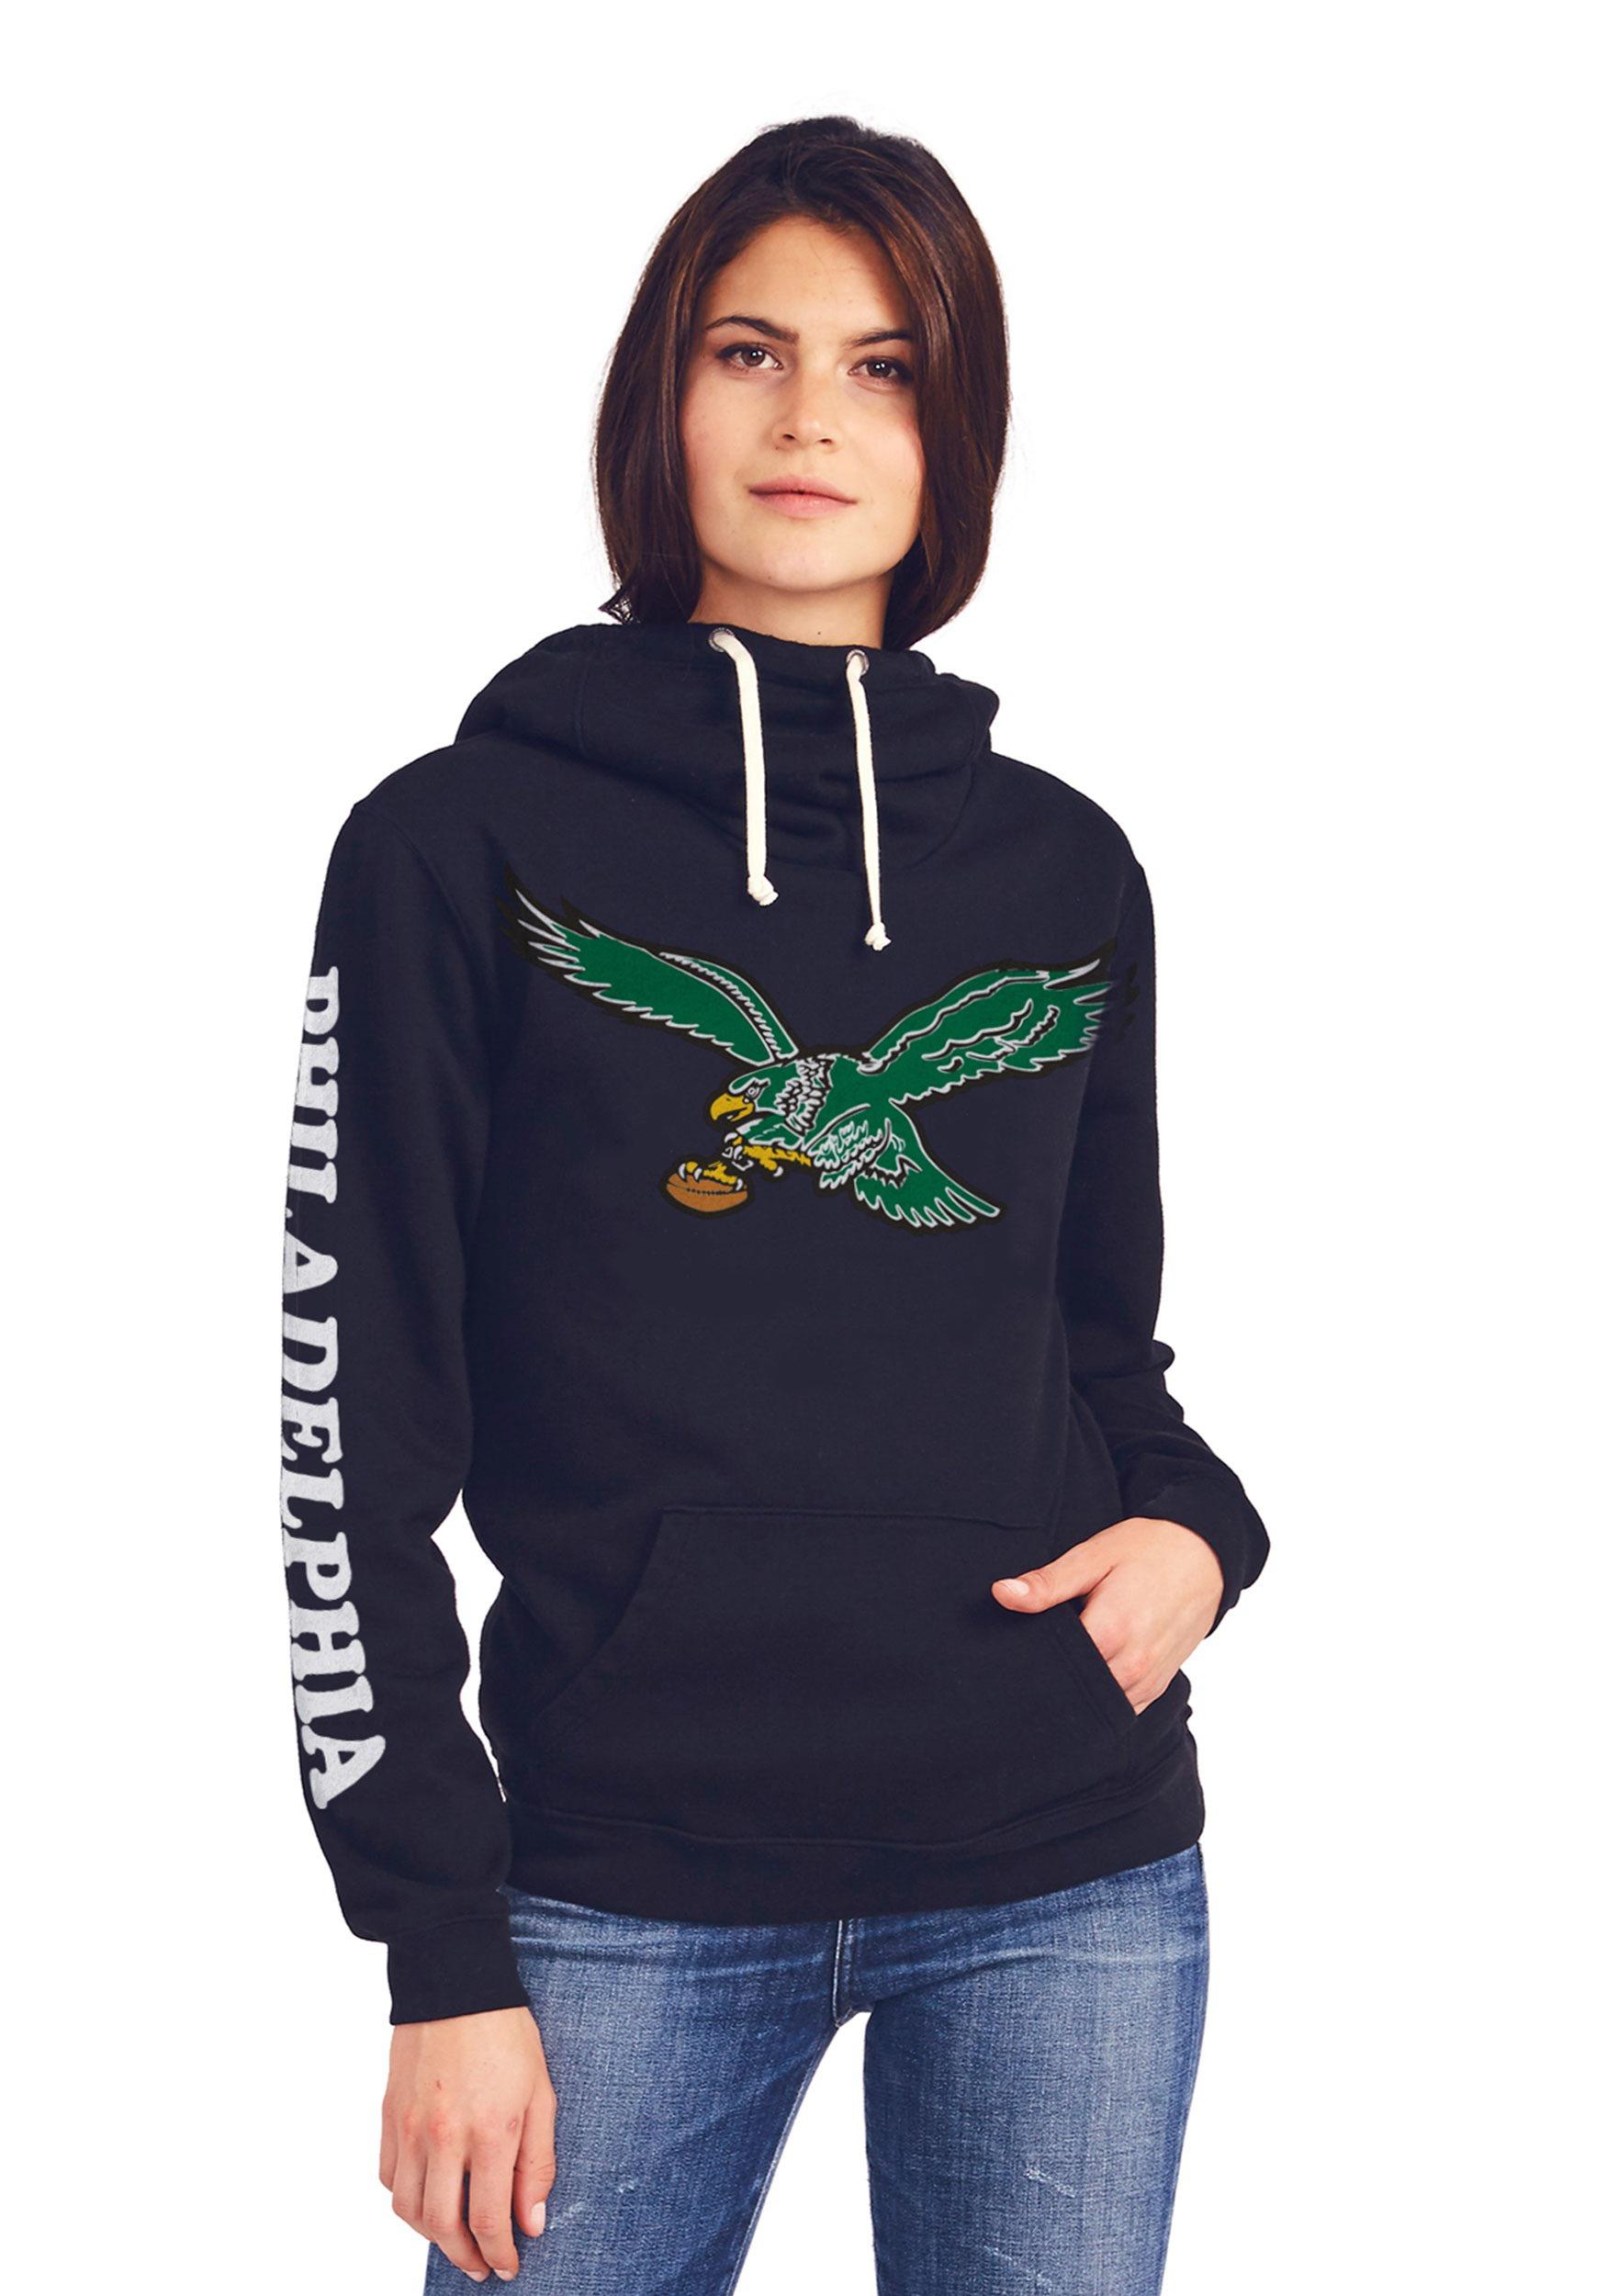 Philadelphia Eagles Women s Cowl Neck Hooded Sweatshirt b0cea6eef